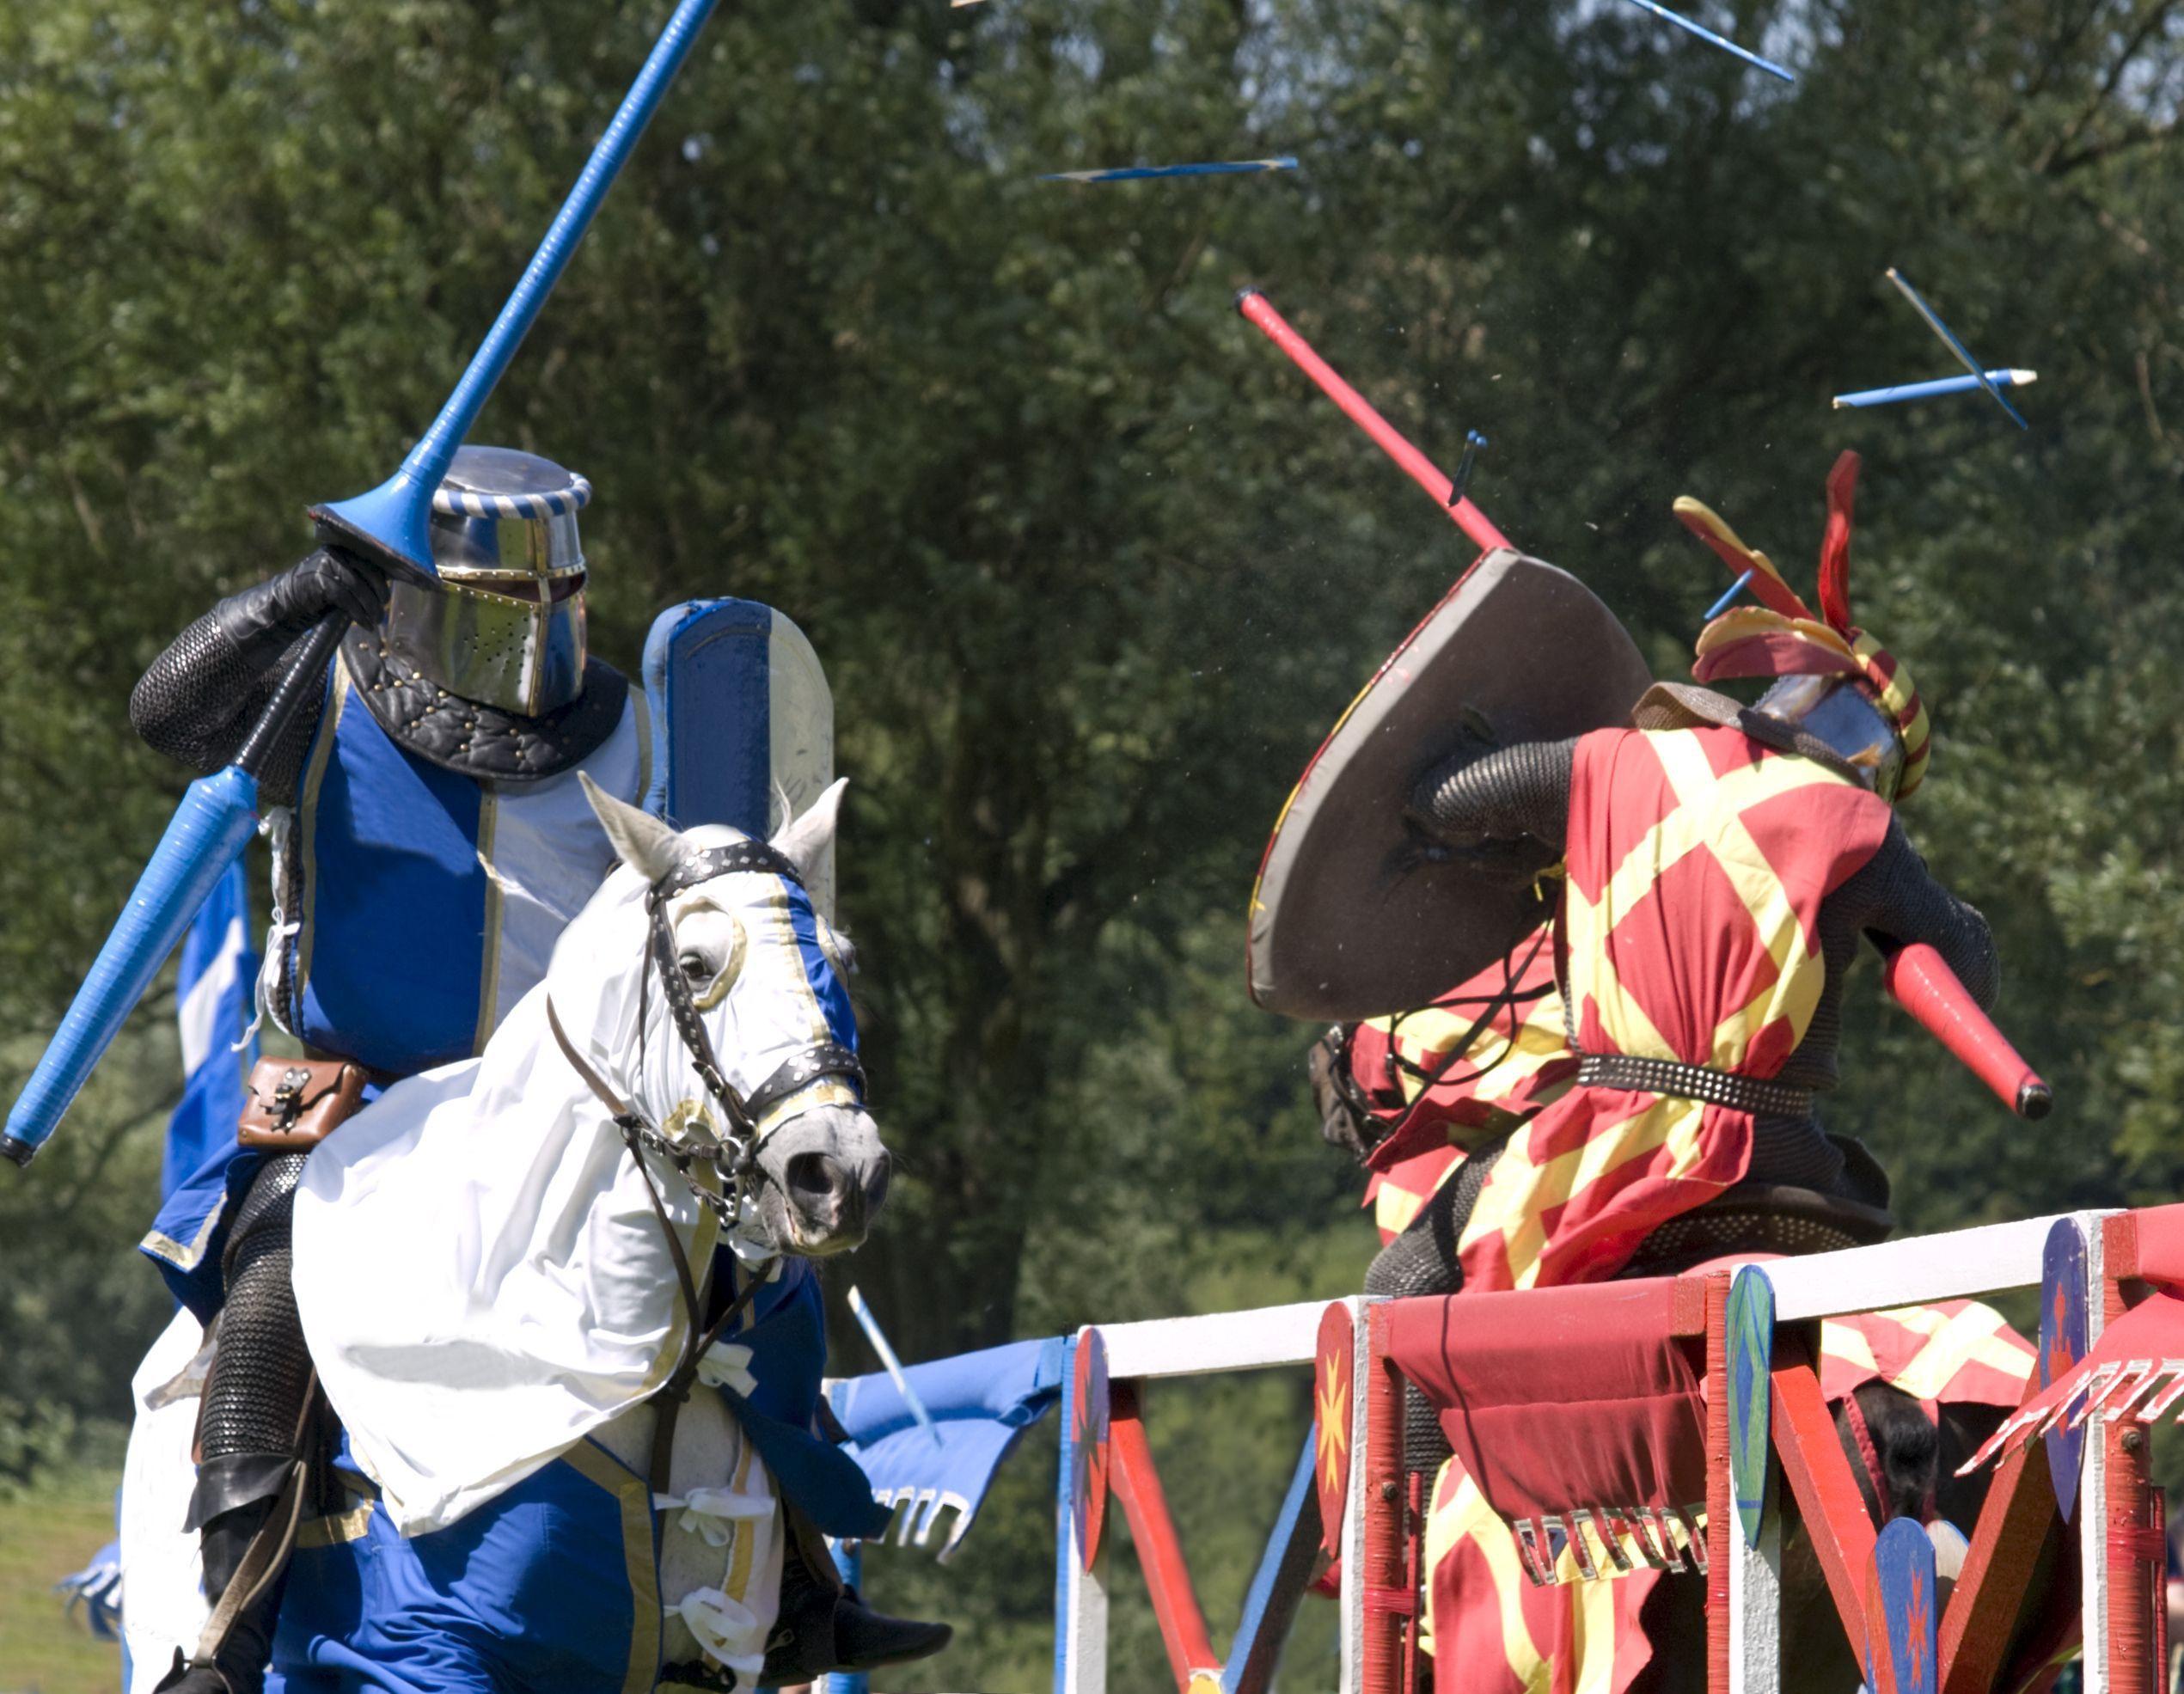 The 2018 Maryland Renaissance Festival